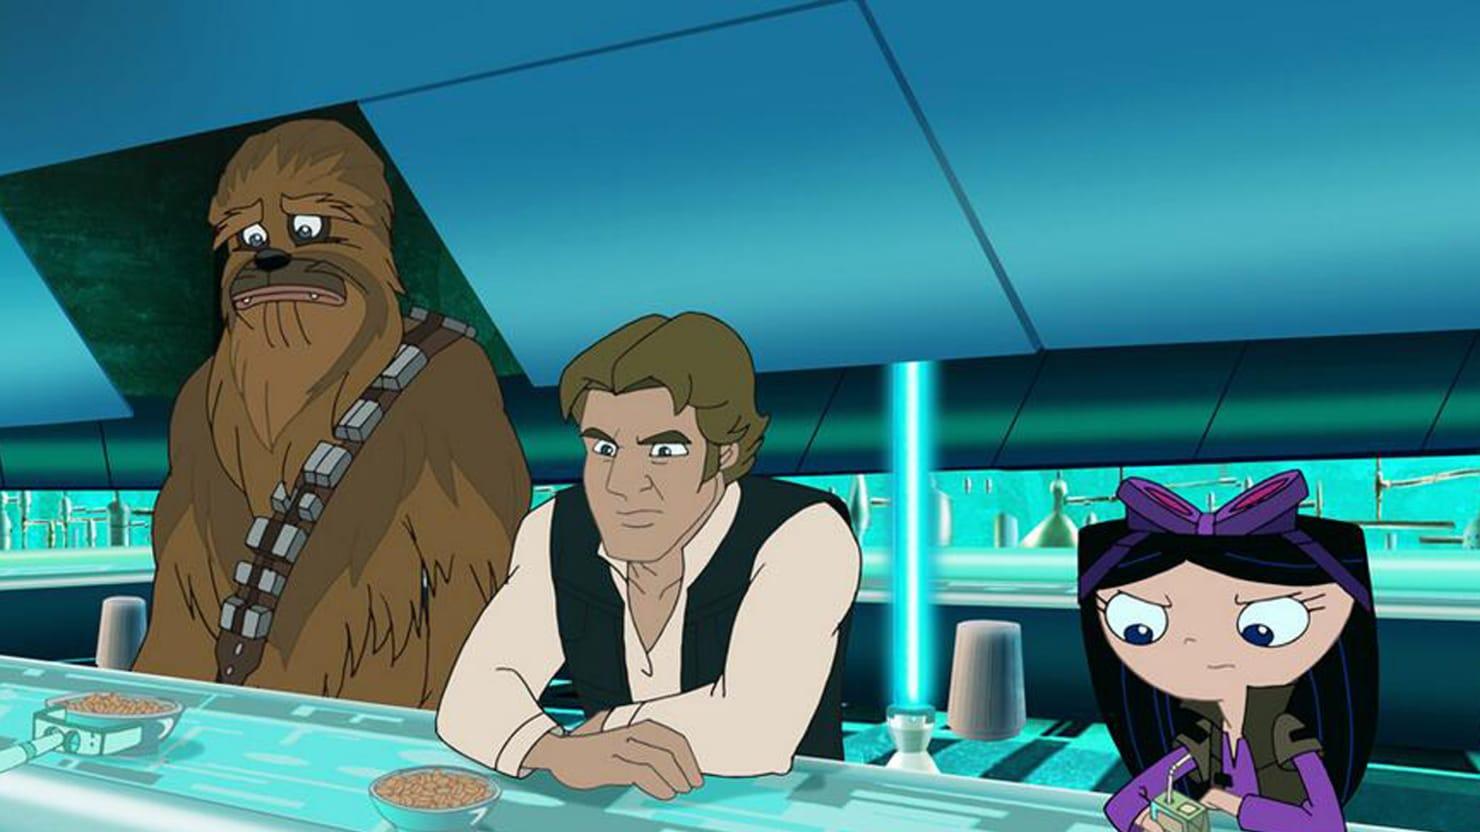 'Phineas and Ferb' Pilot Disney's Premier Voyage into ...